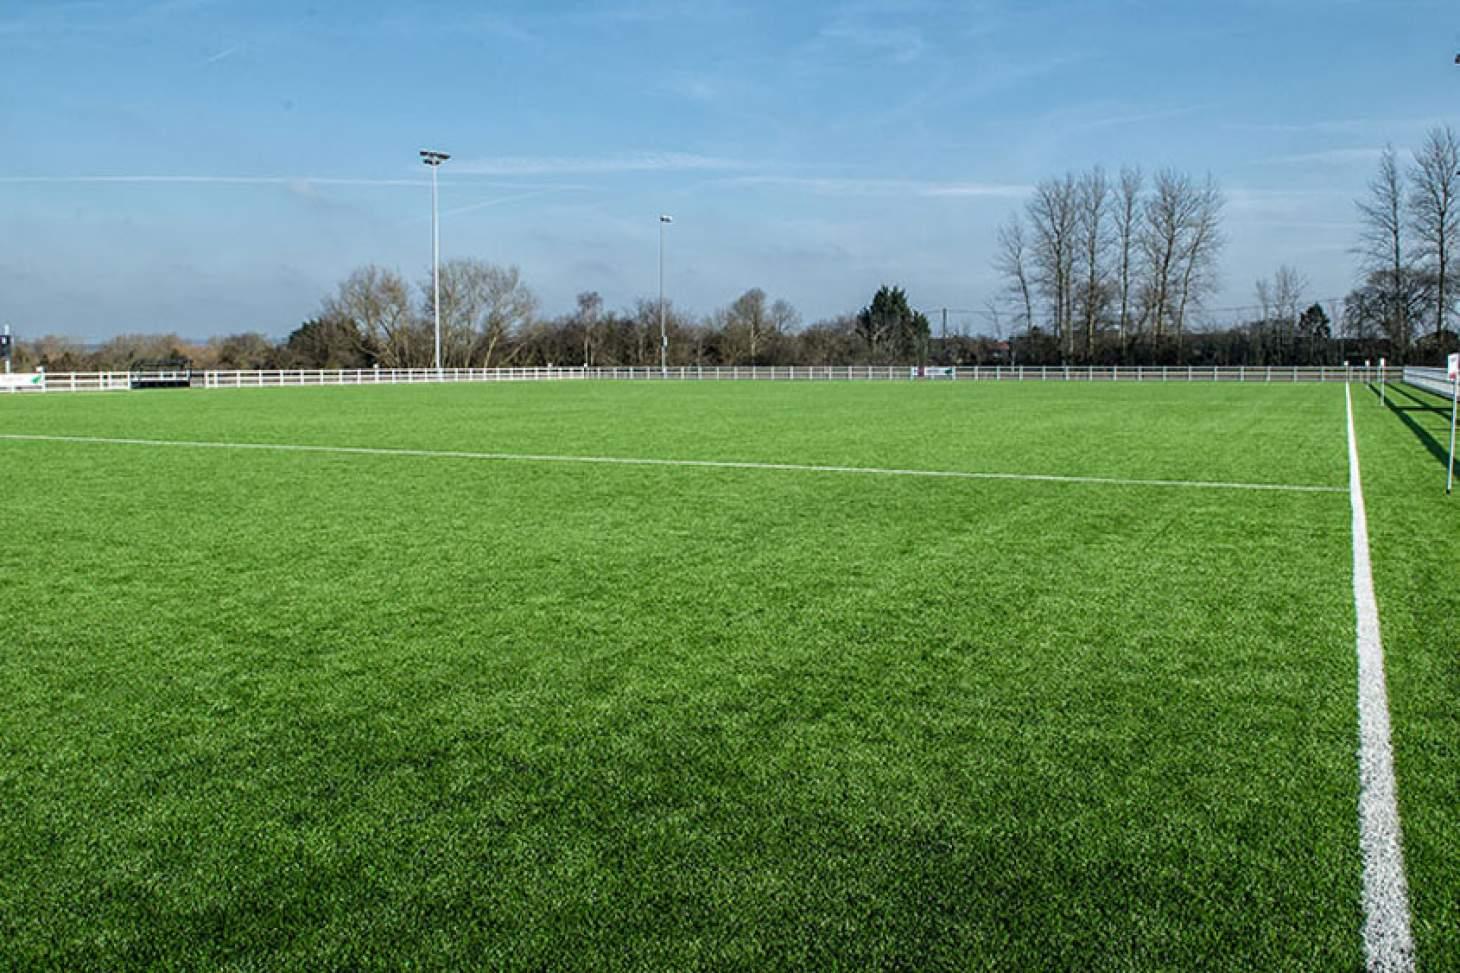 PlayFootball Stourbridge 8 a side | 3G Astroturf football pitch